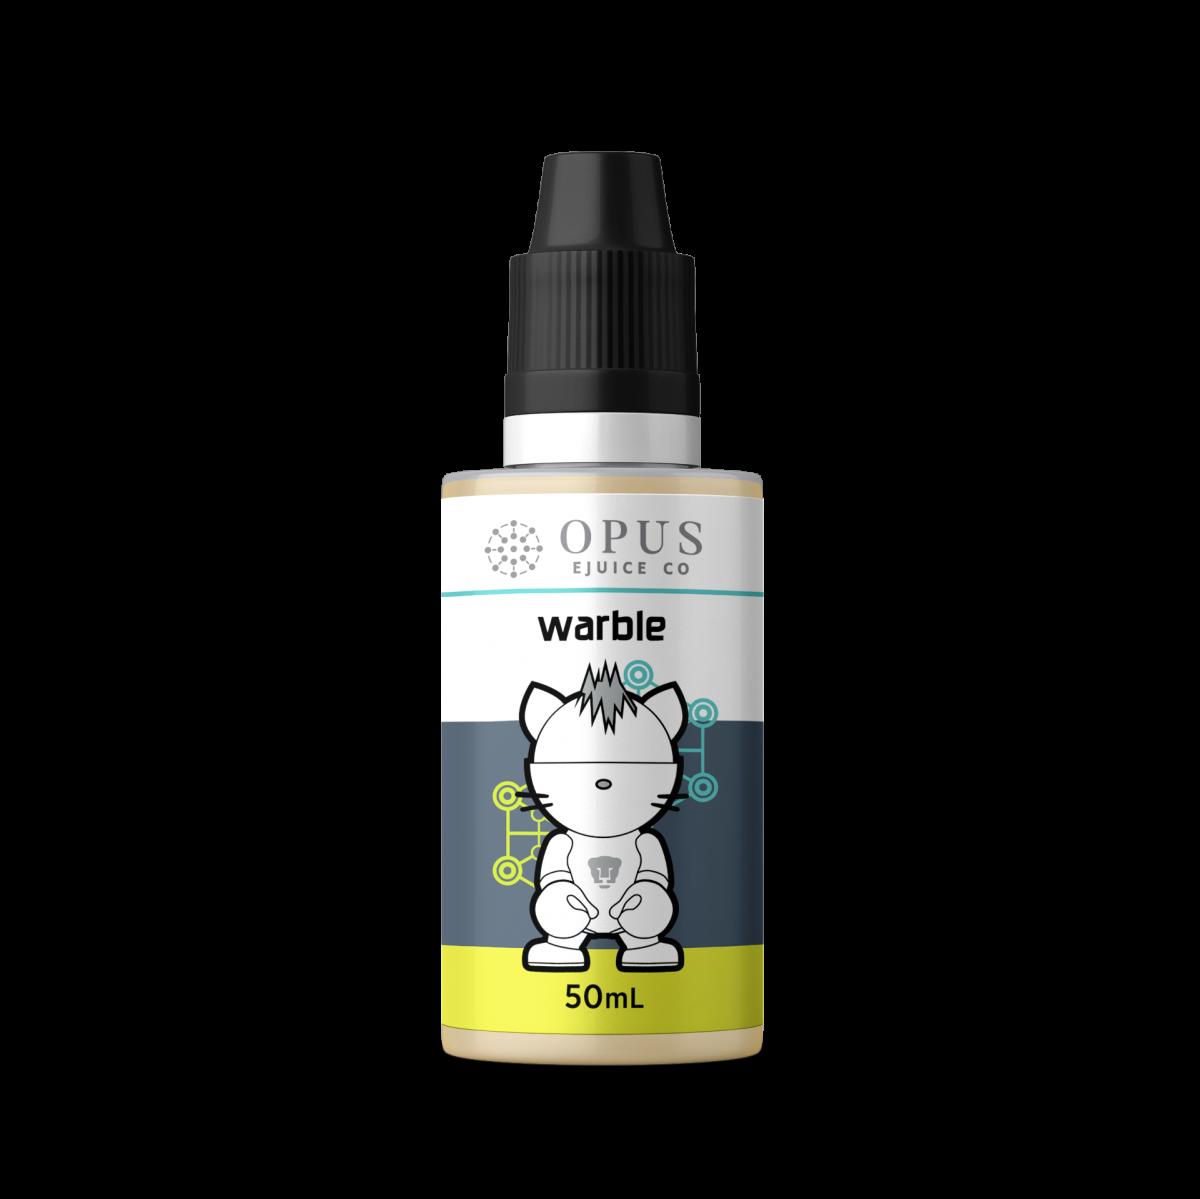 Opus warble e-liquid